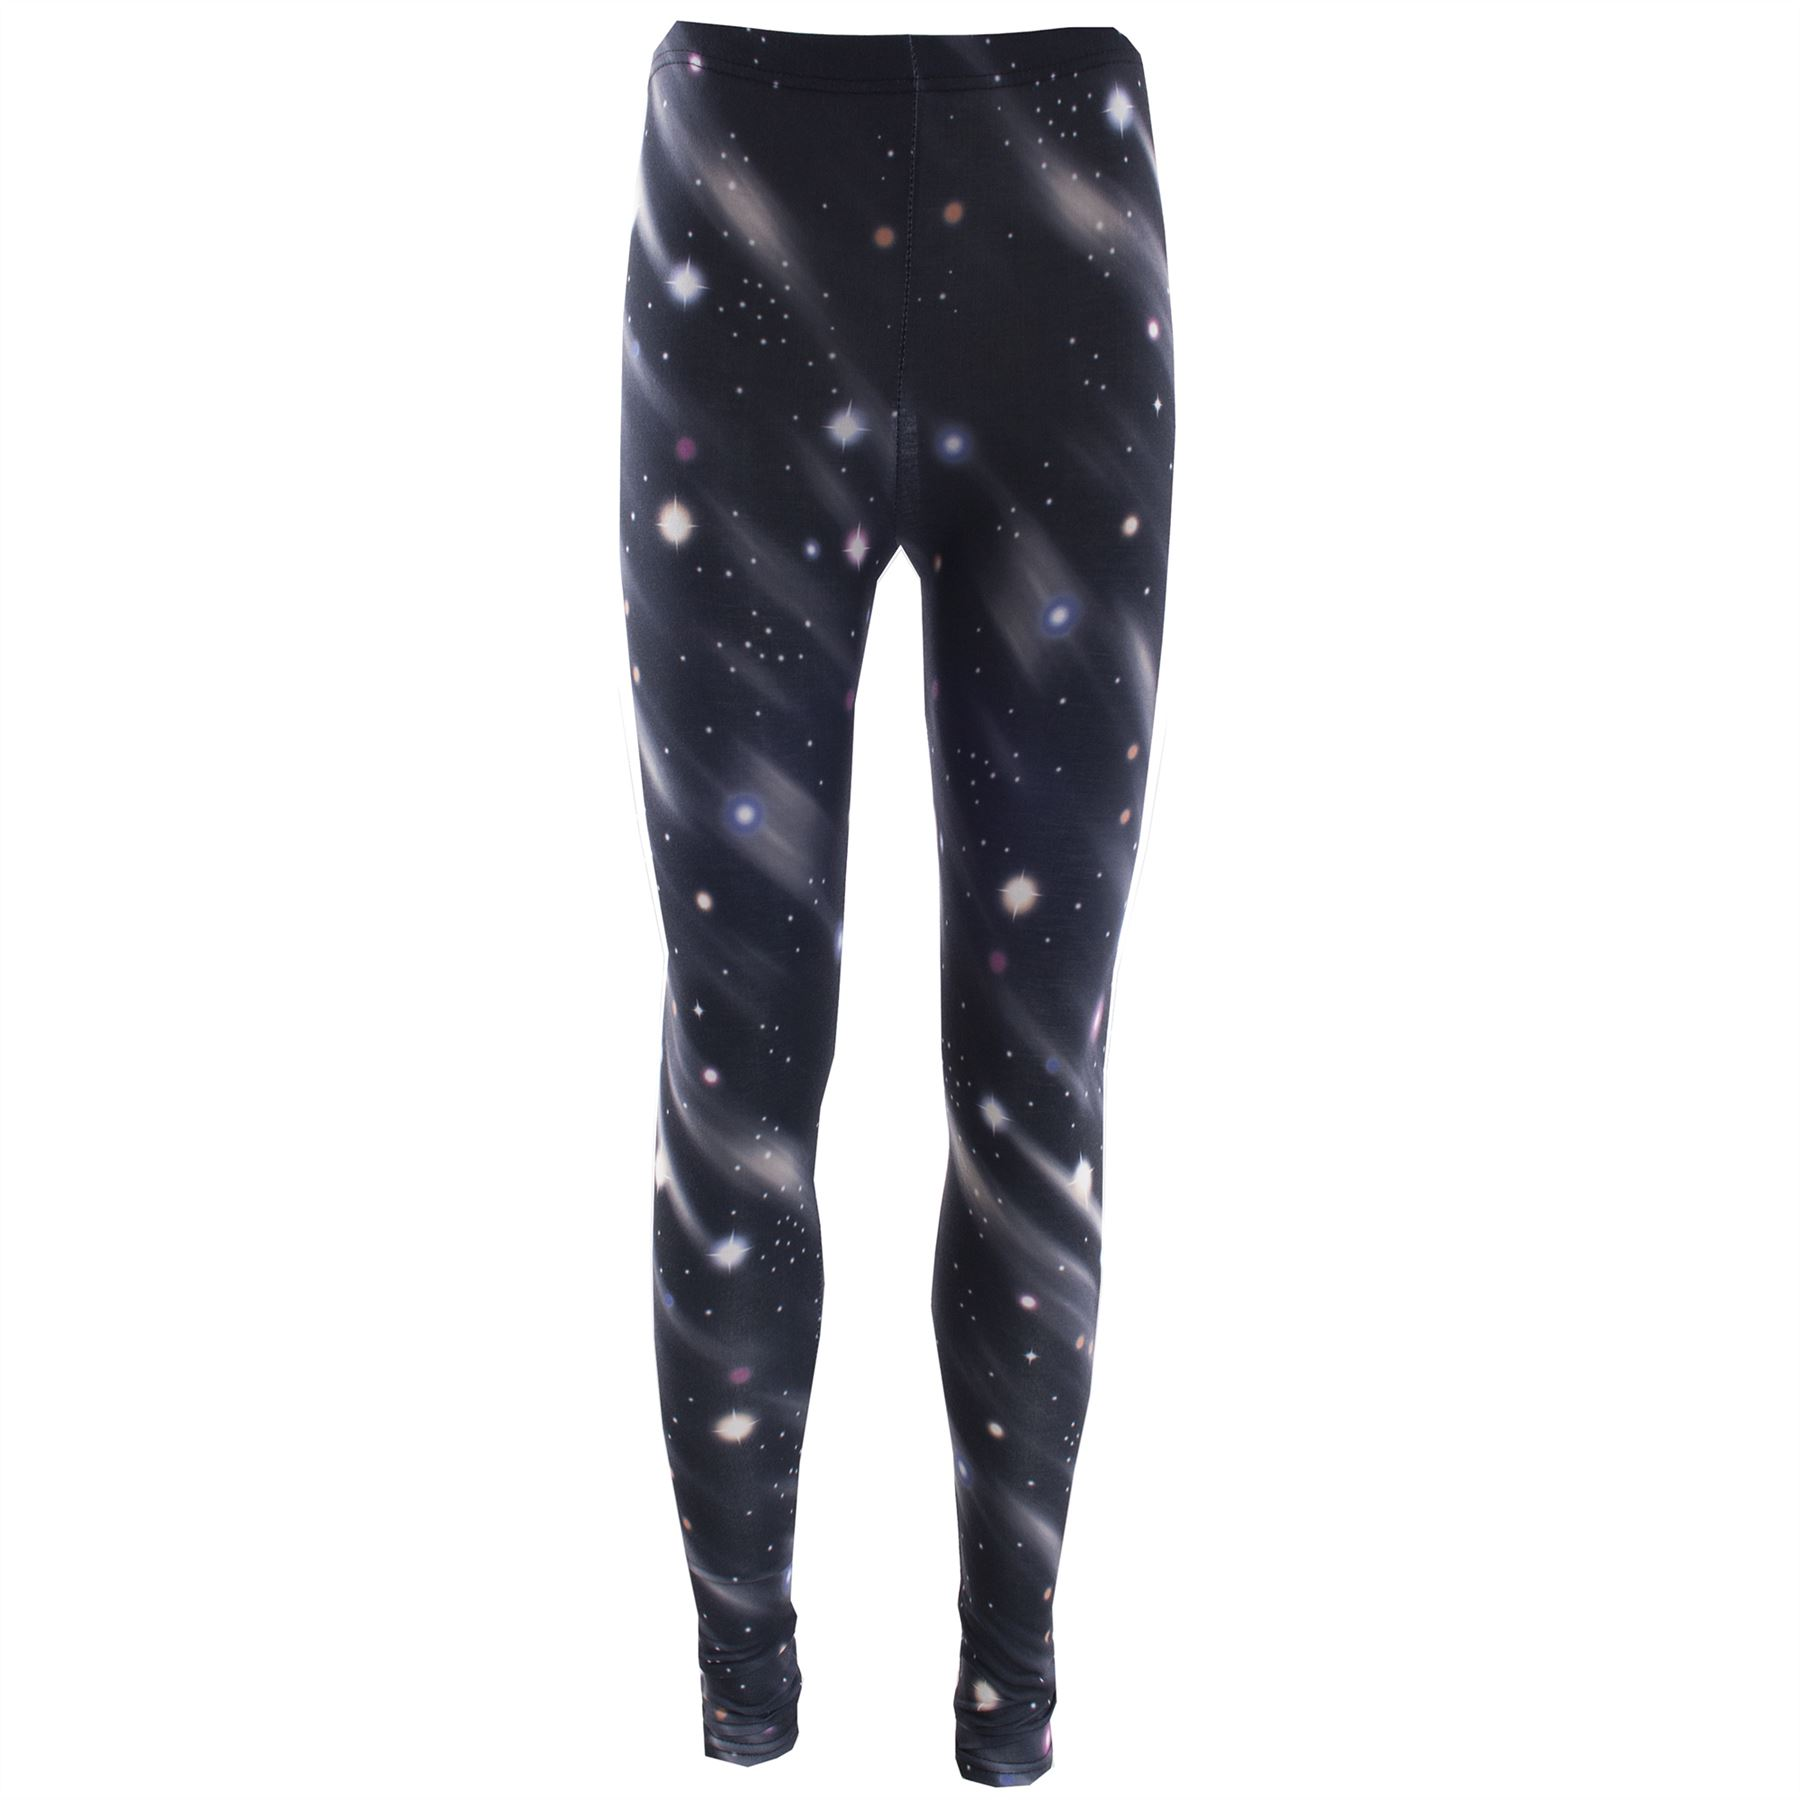 Cool Print Pants Women | Pant So